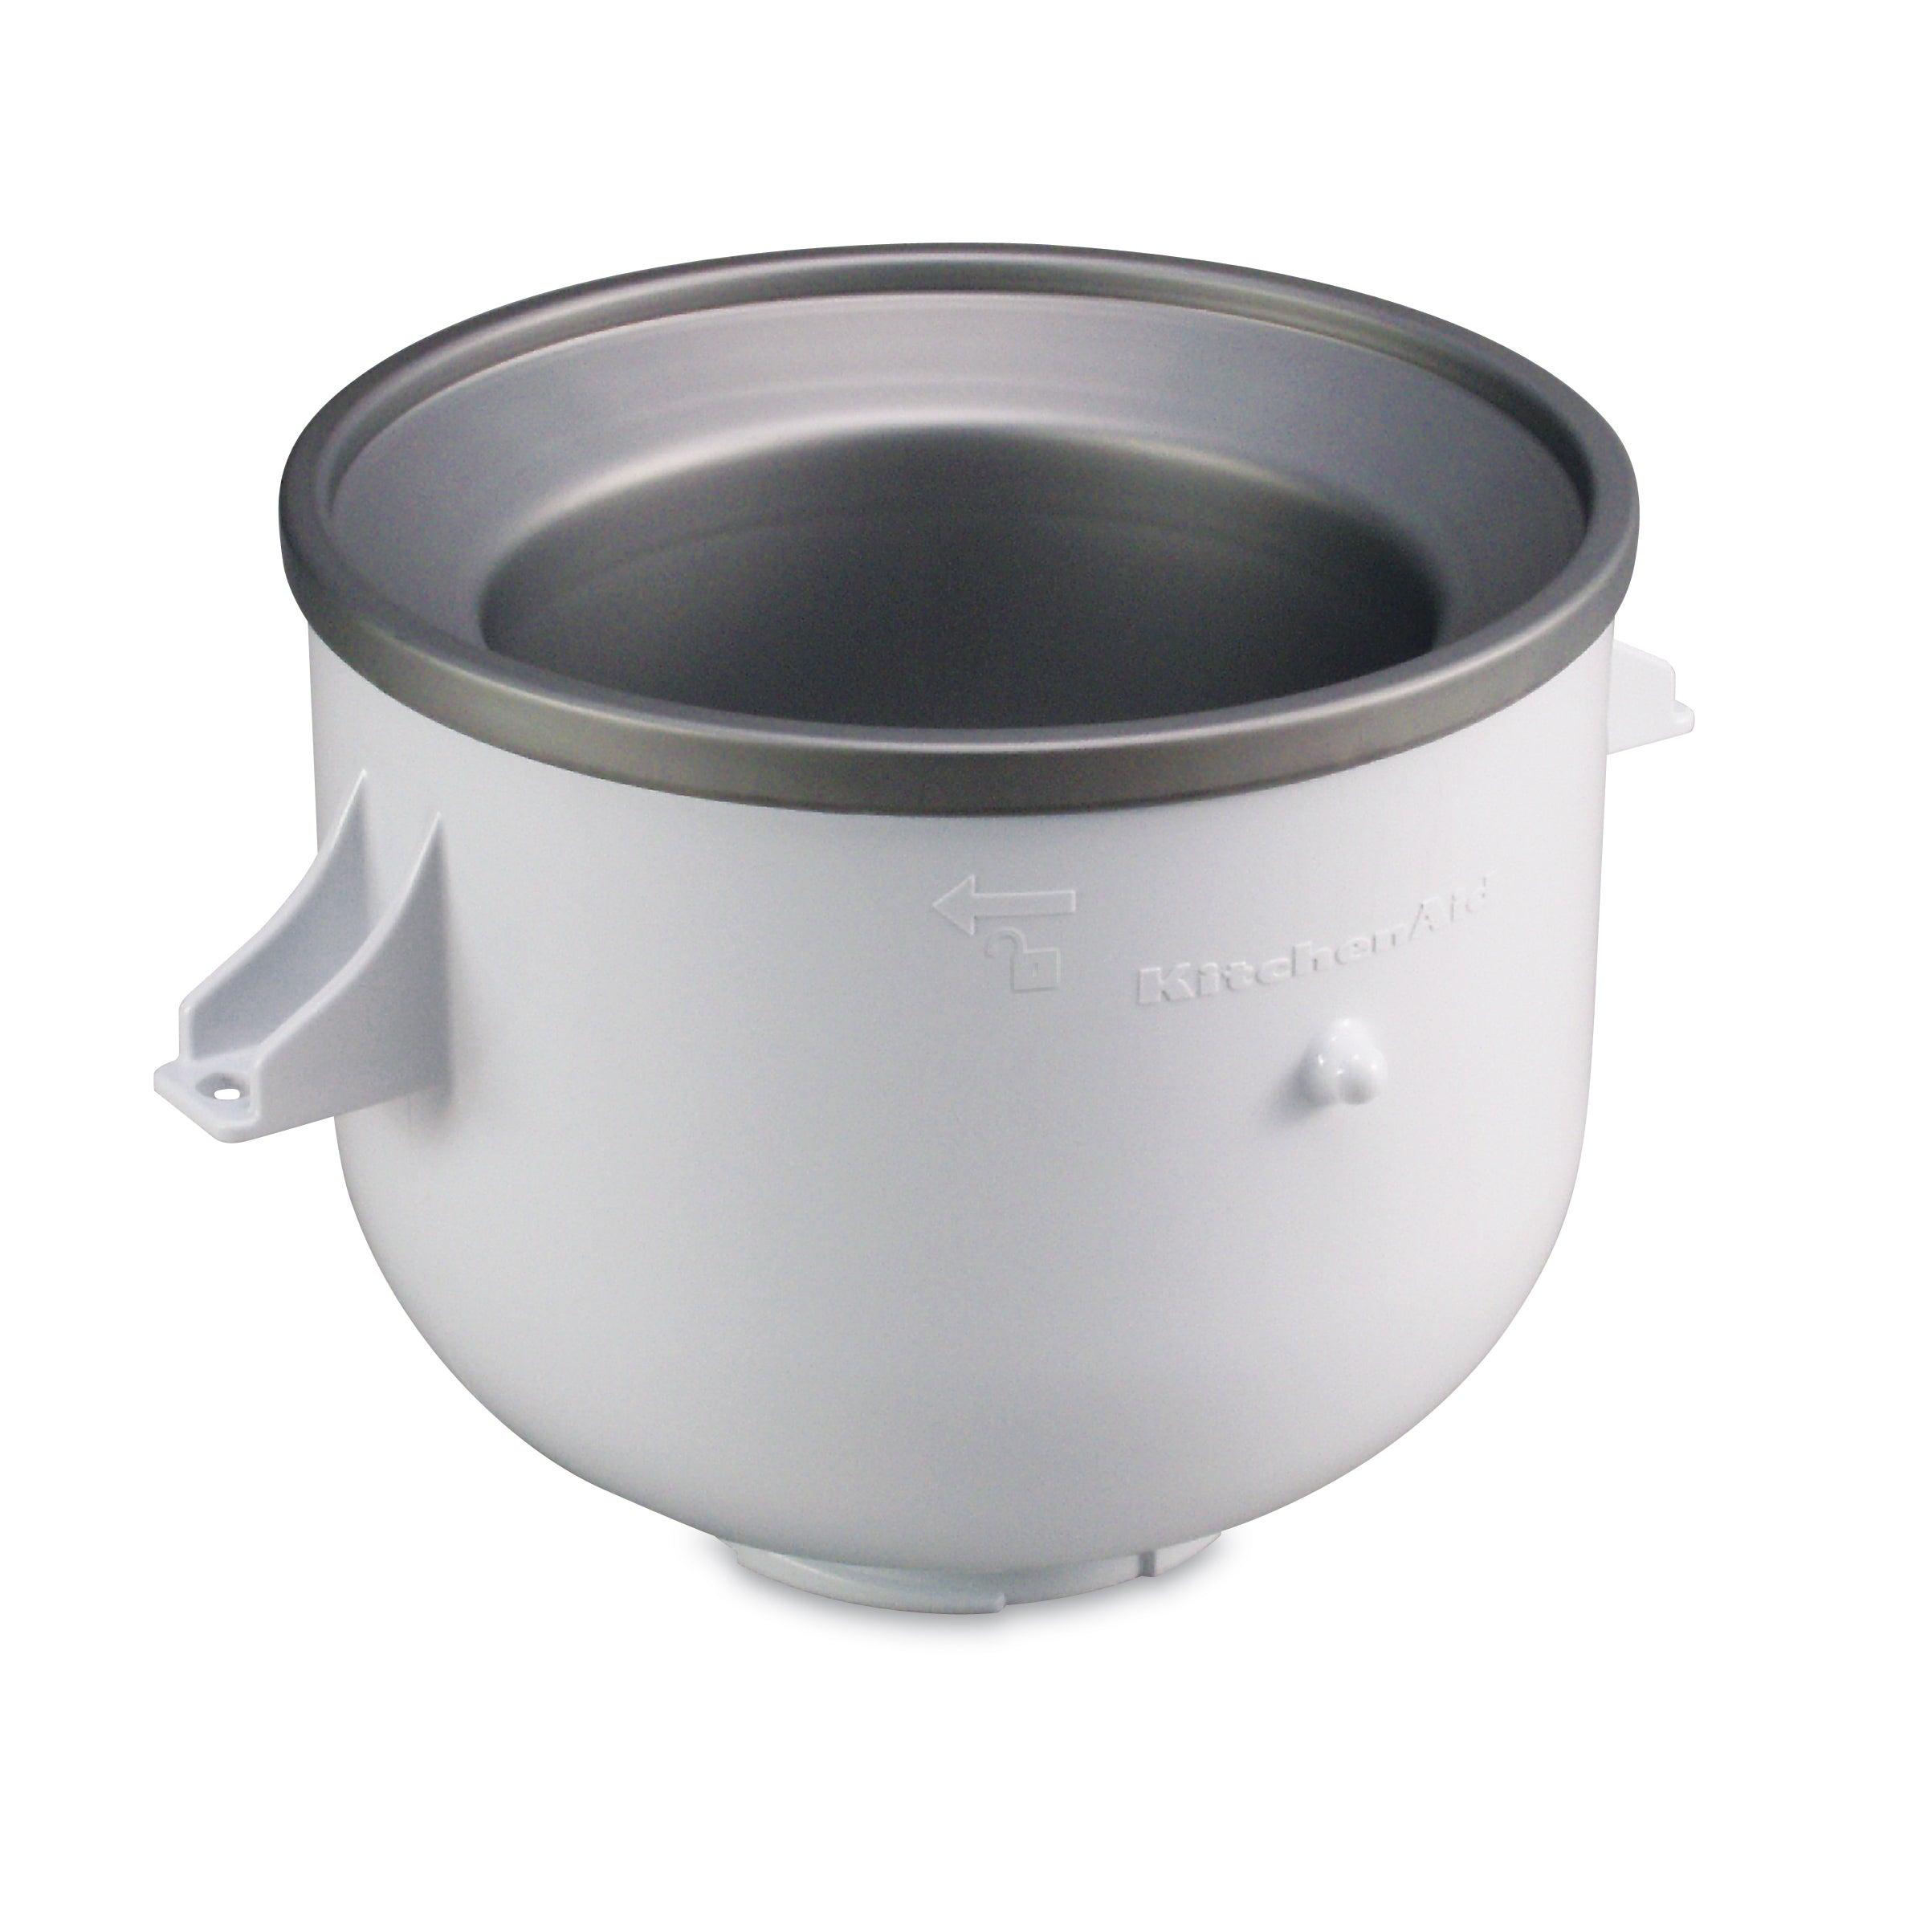 Shop KitchenAid KICA0WH White Ice Cream Bowl Attachment - Free ... on oneida ice cream bowl, kitchenaid blender, disney ice cream bowl, kitchenaid teapot, kitchenaid sausage stuffer, le creuset ice cream bowl,